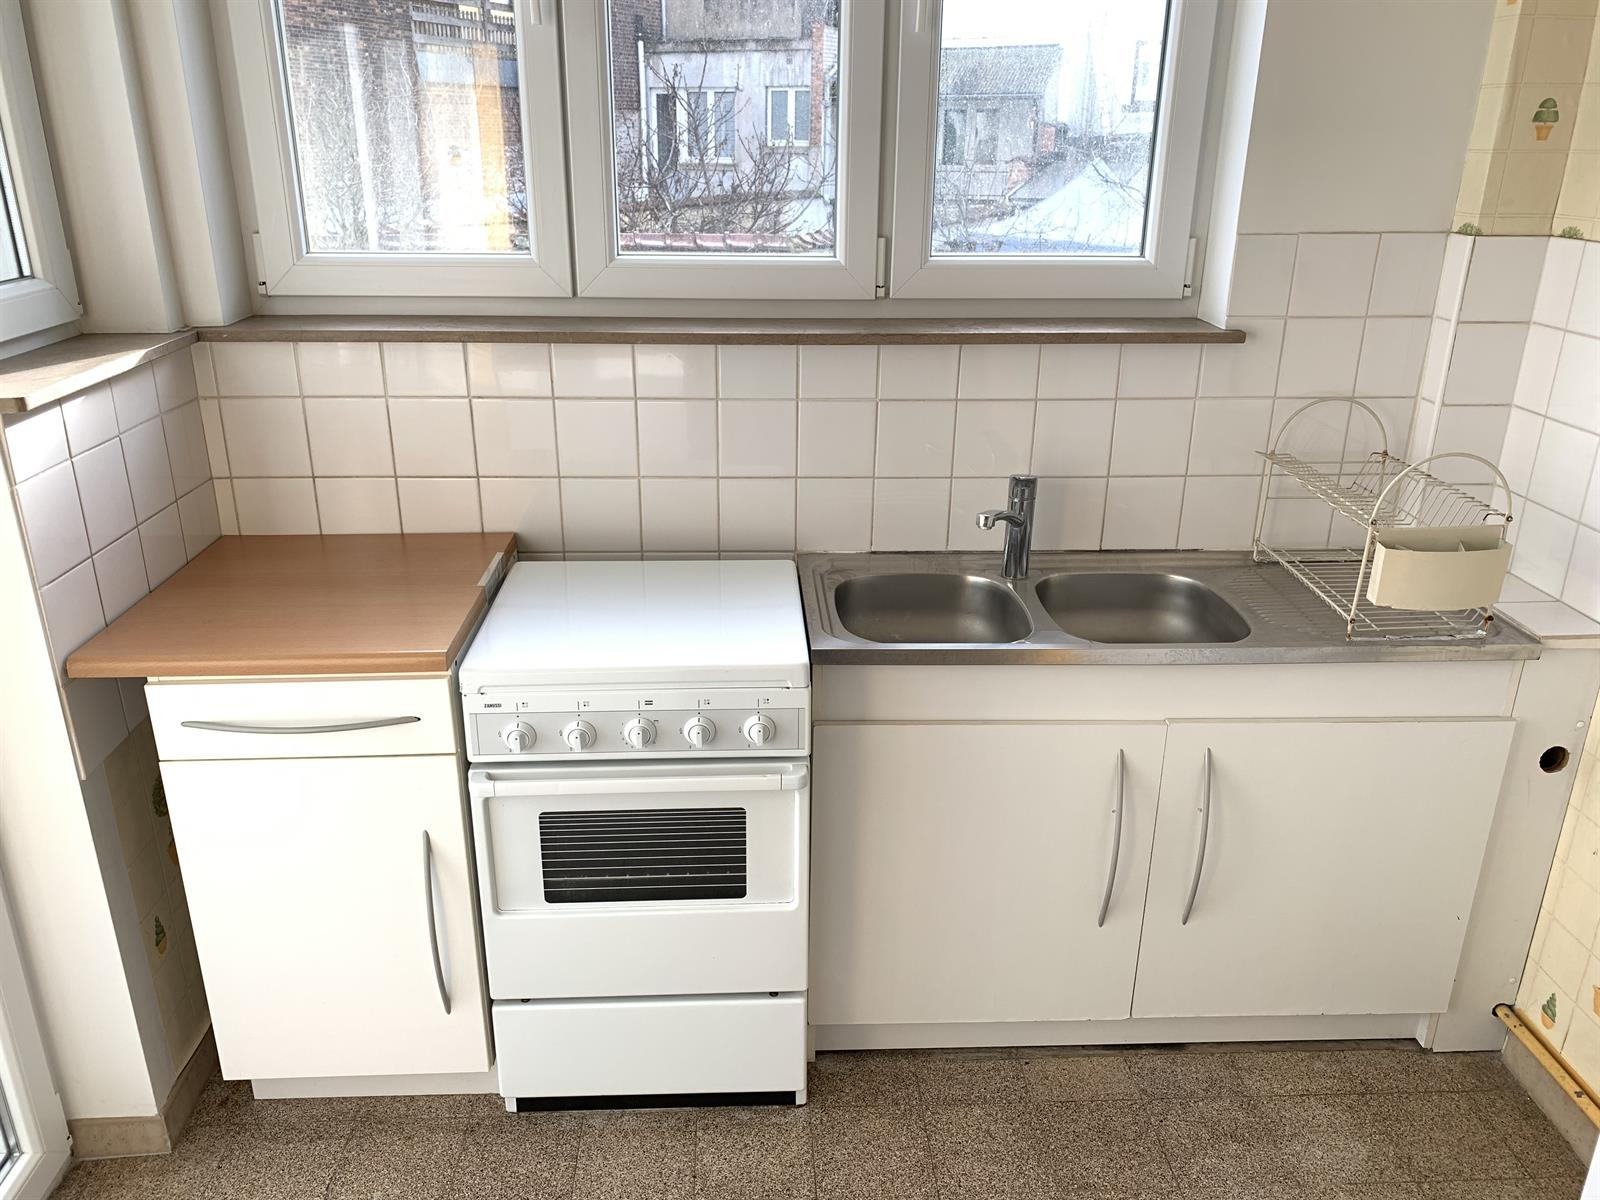 Flat - Molenbeek-Saint-Jean - #3956375-20